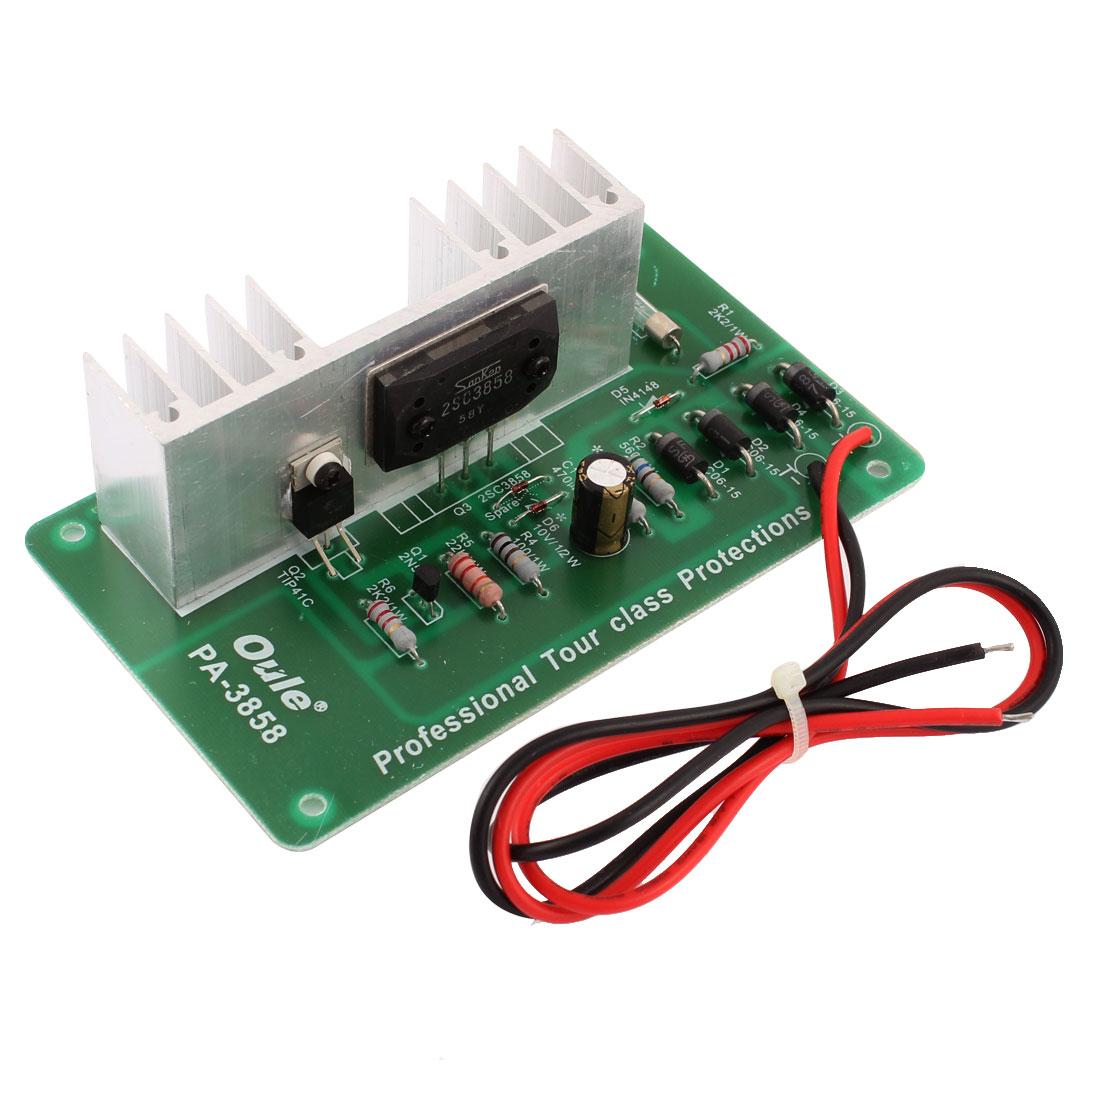 14.3cm x 8.3cm Metal Speaker Audio Protective Circuit Board for Vehicle